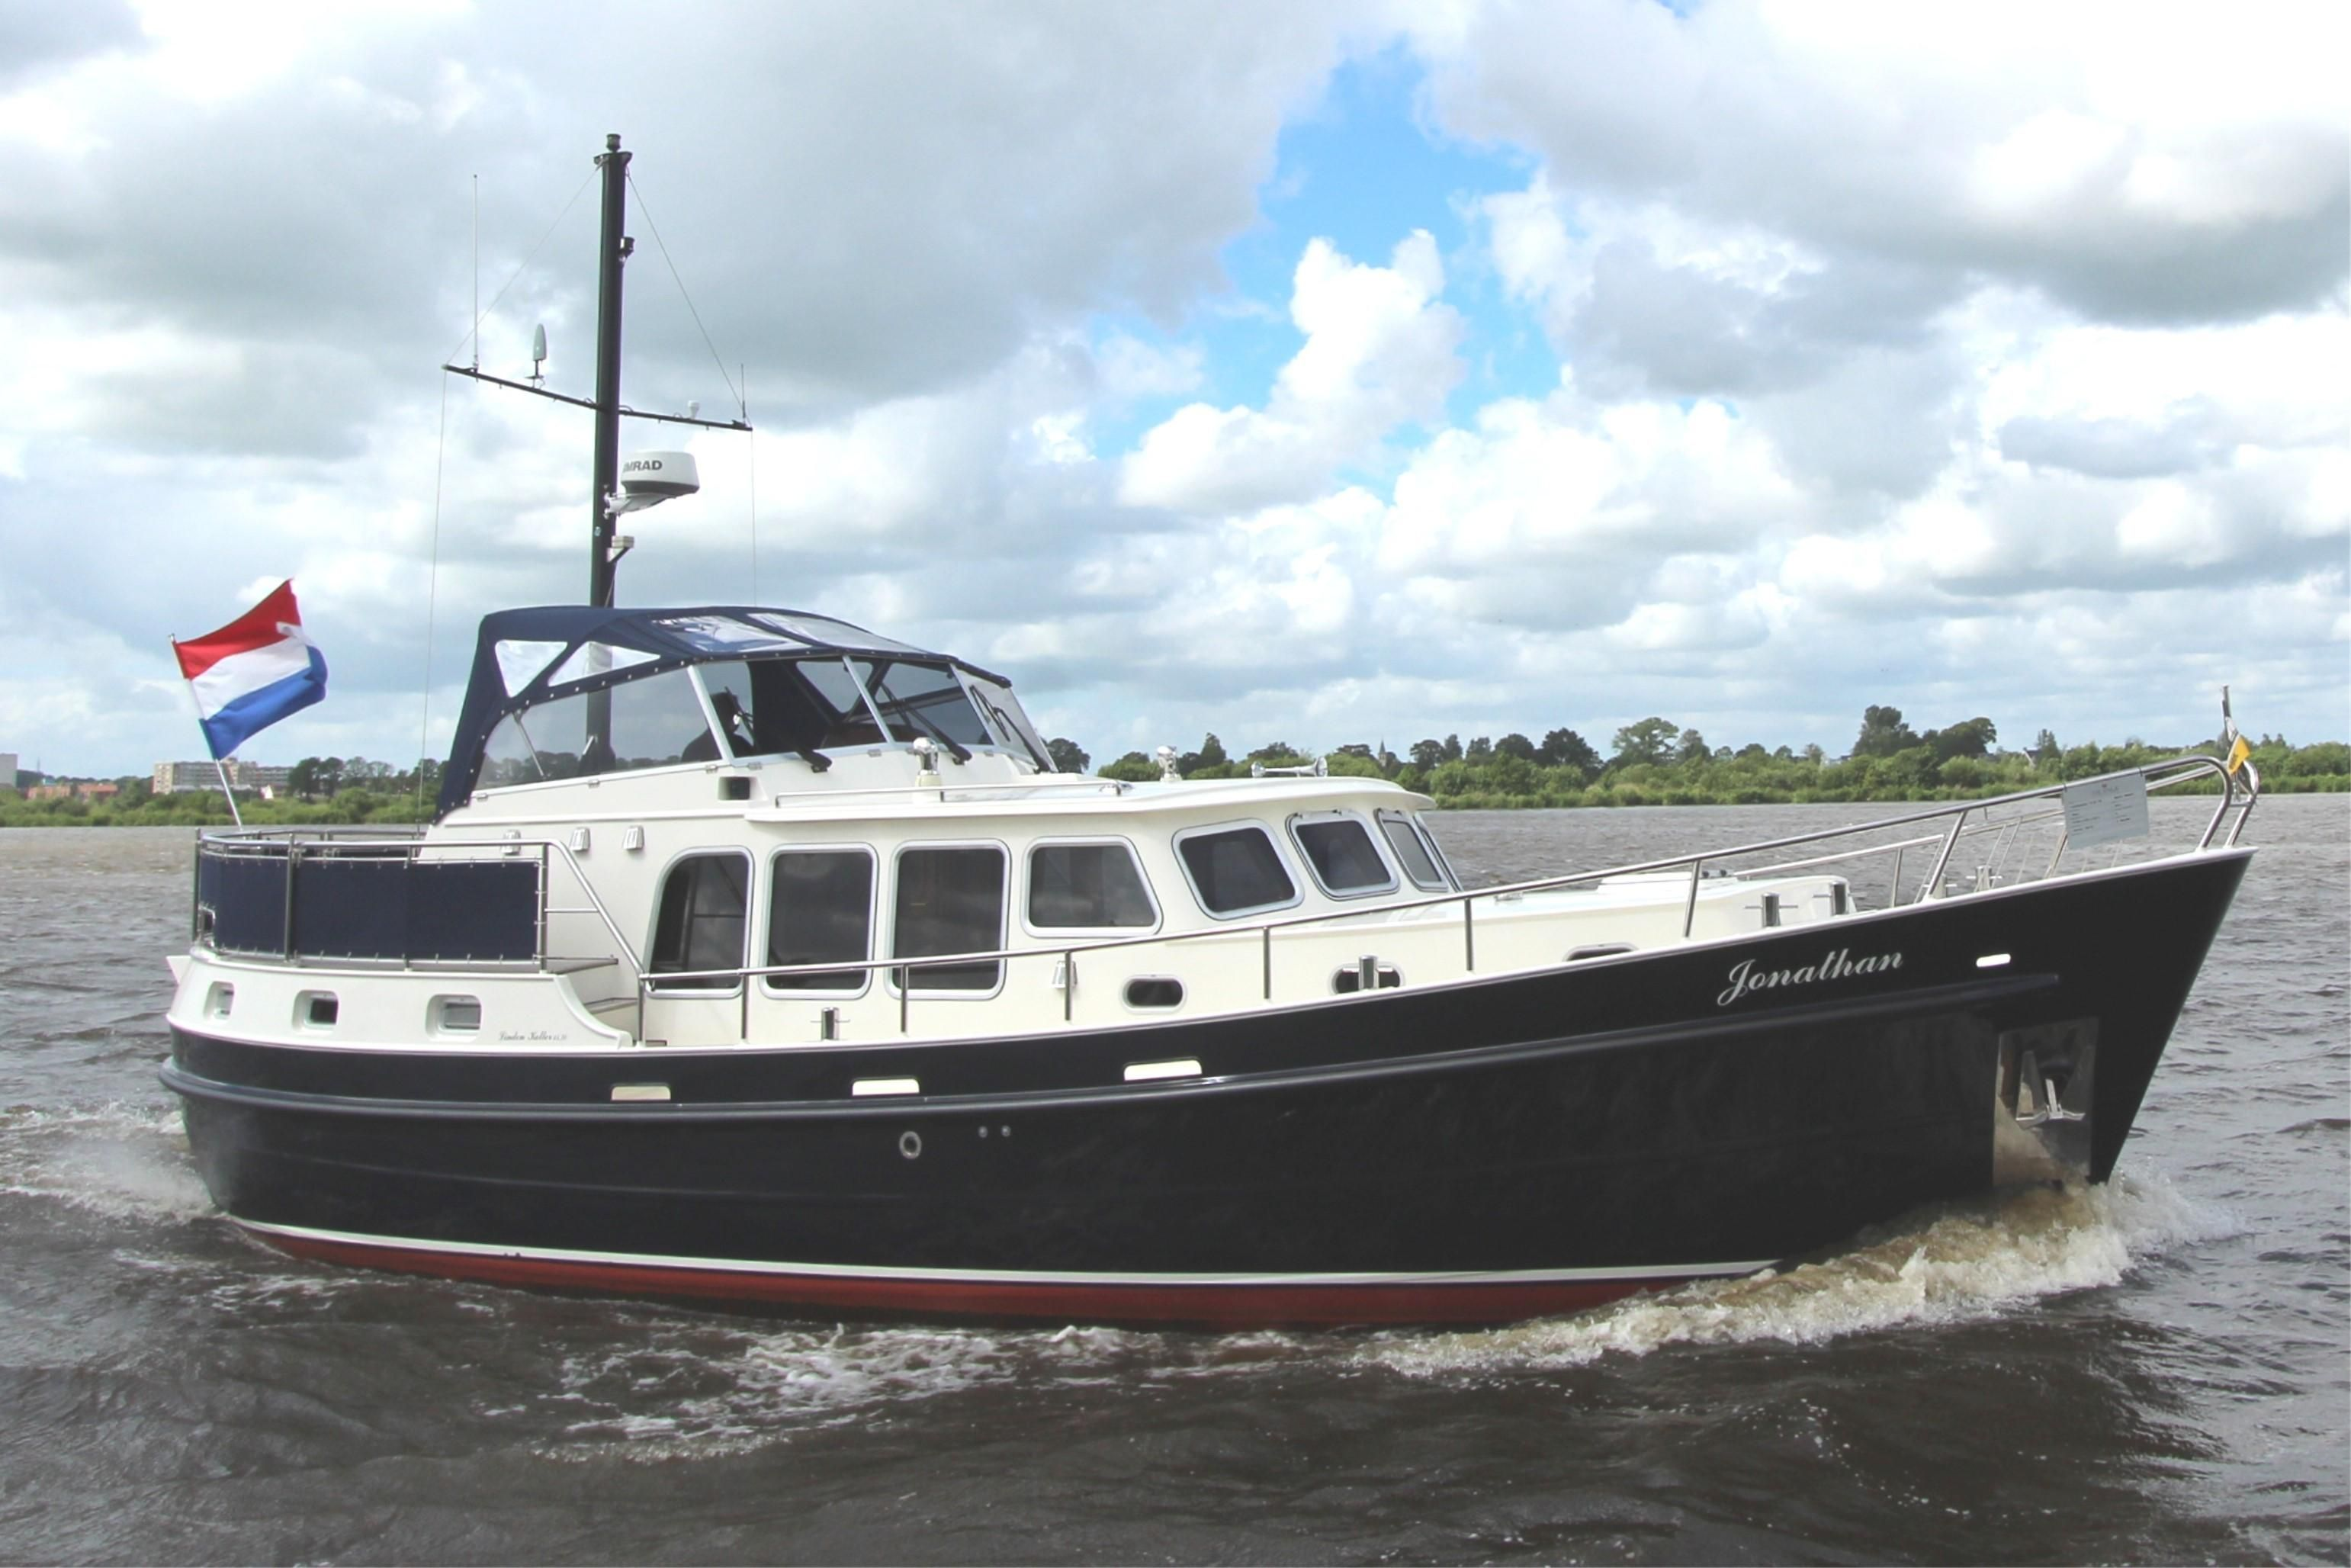 2011 Linden Kotter 13.70 AK Power Boat For Sale - www ...